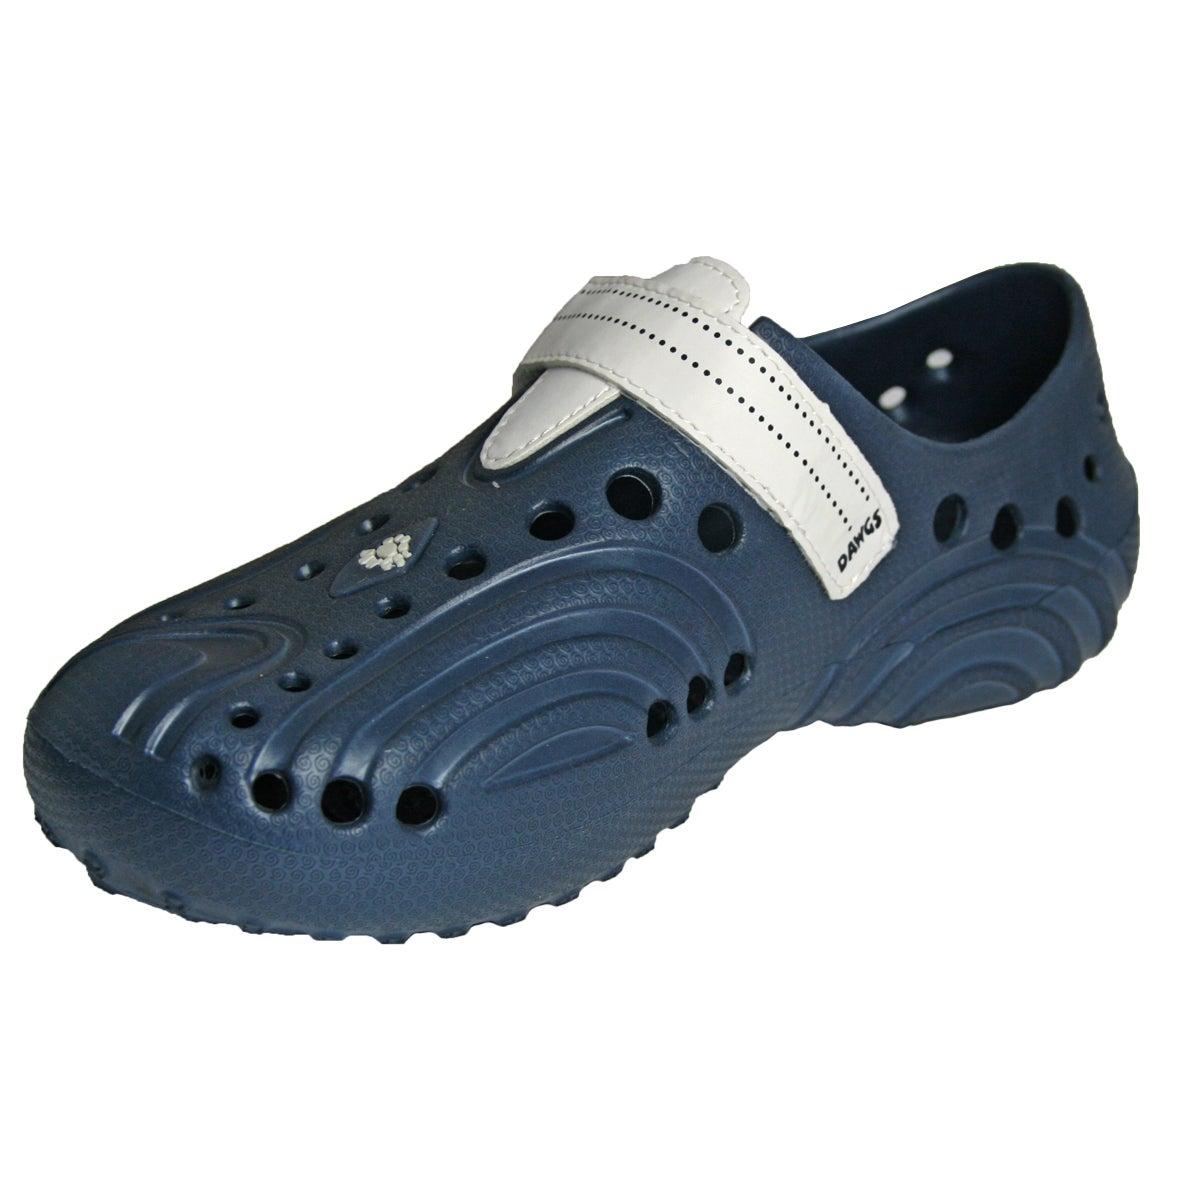 COMVIP Adults Children Elastic Solid Canvas Ballet Slipper Dance Yoga Shoes